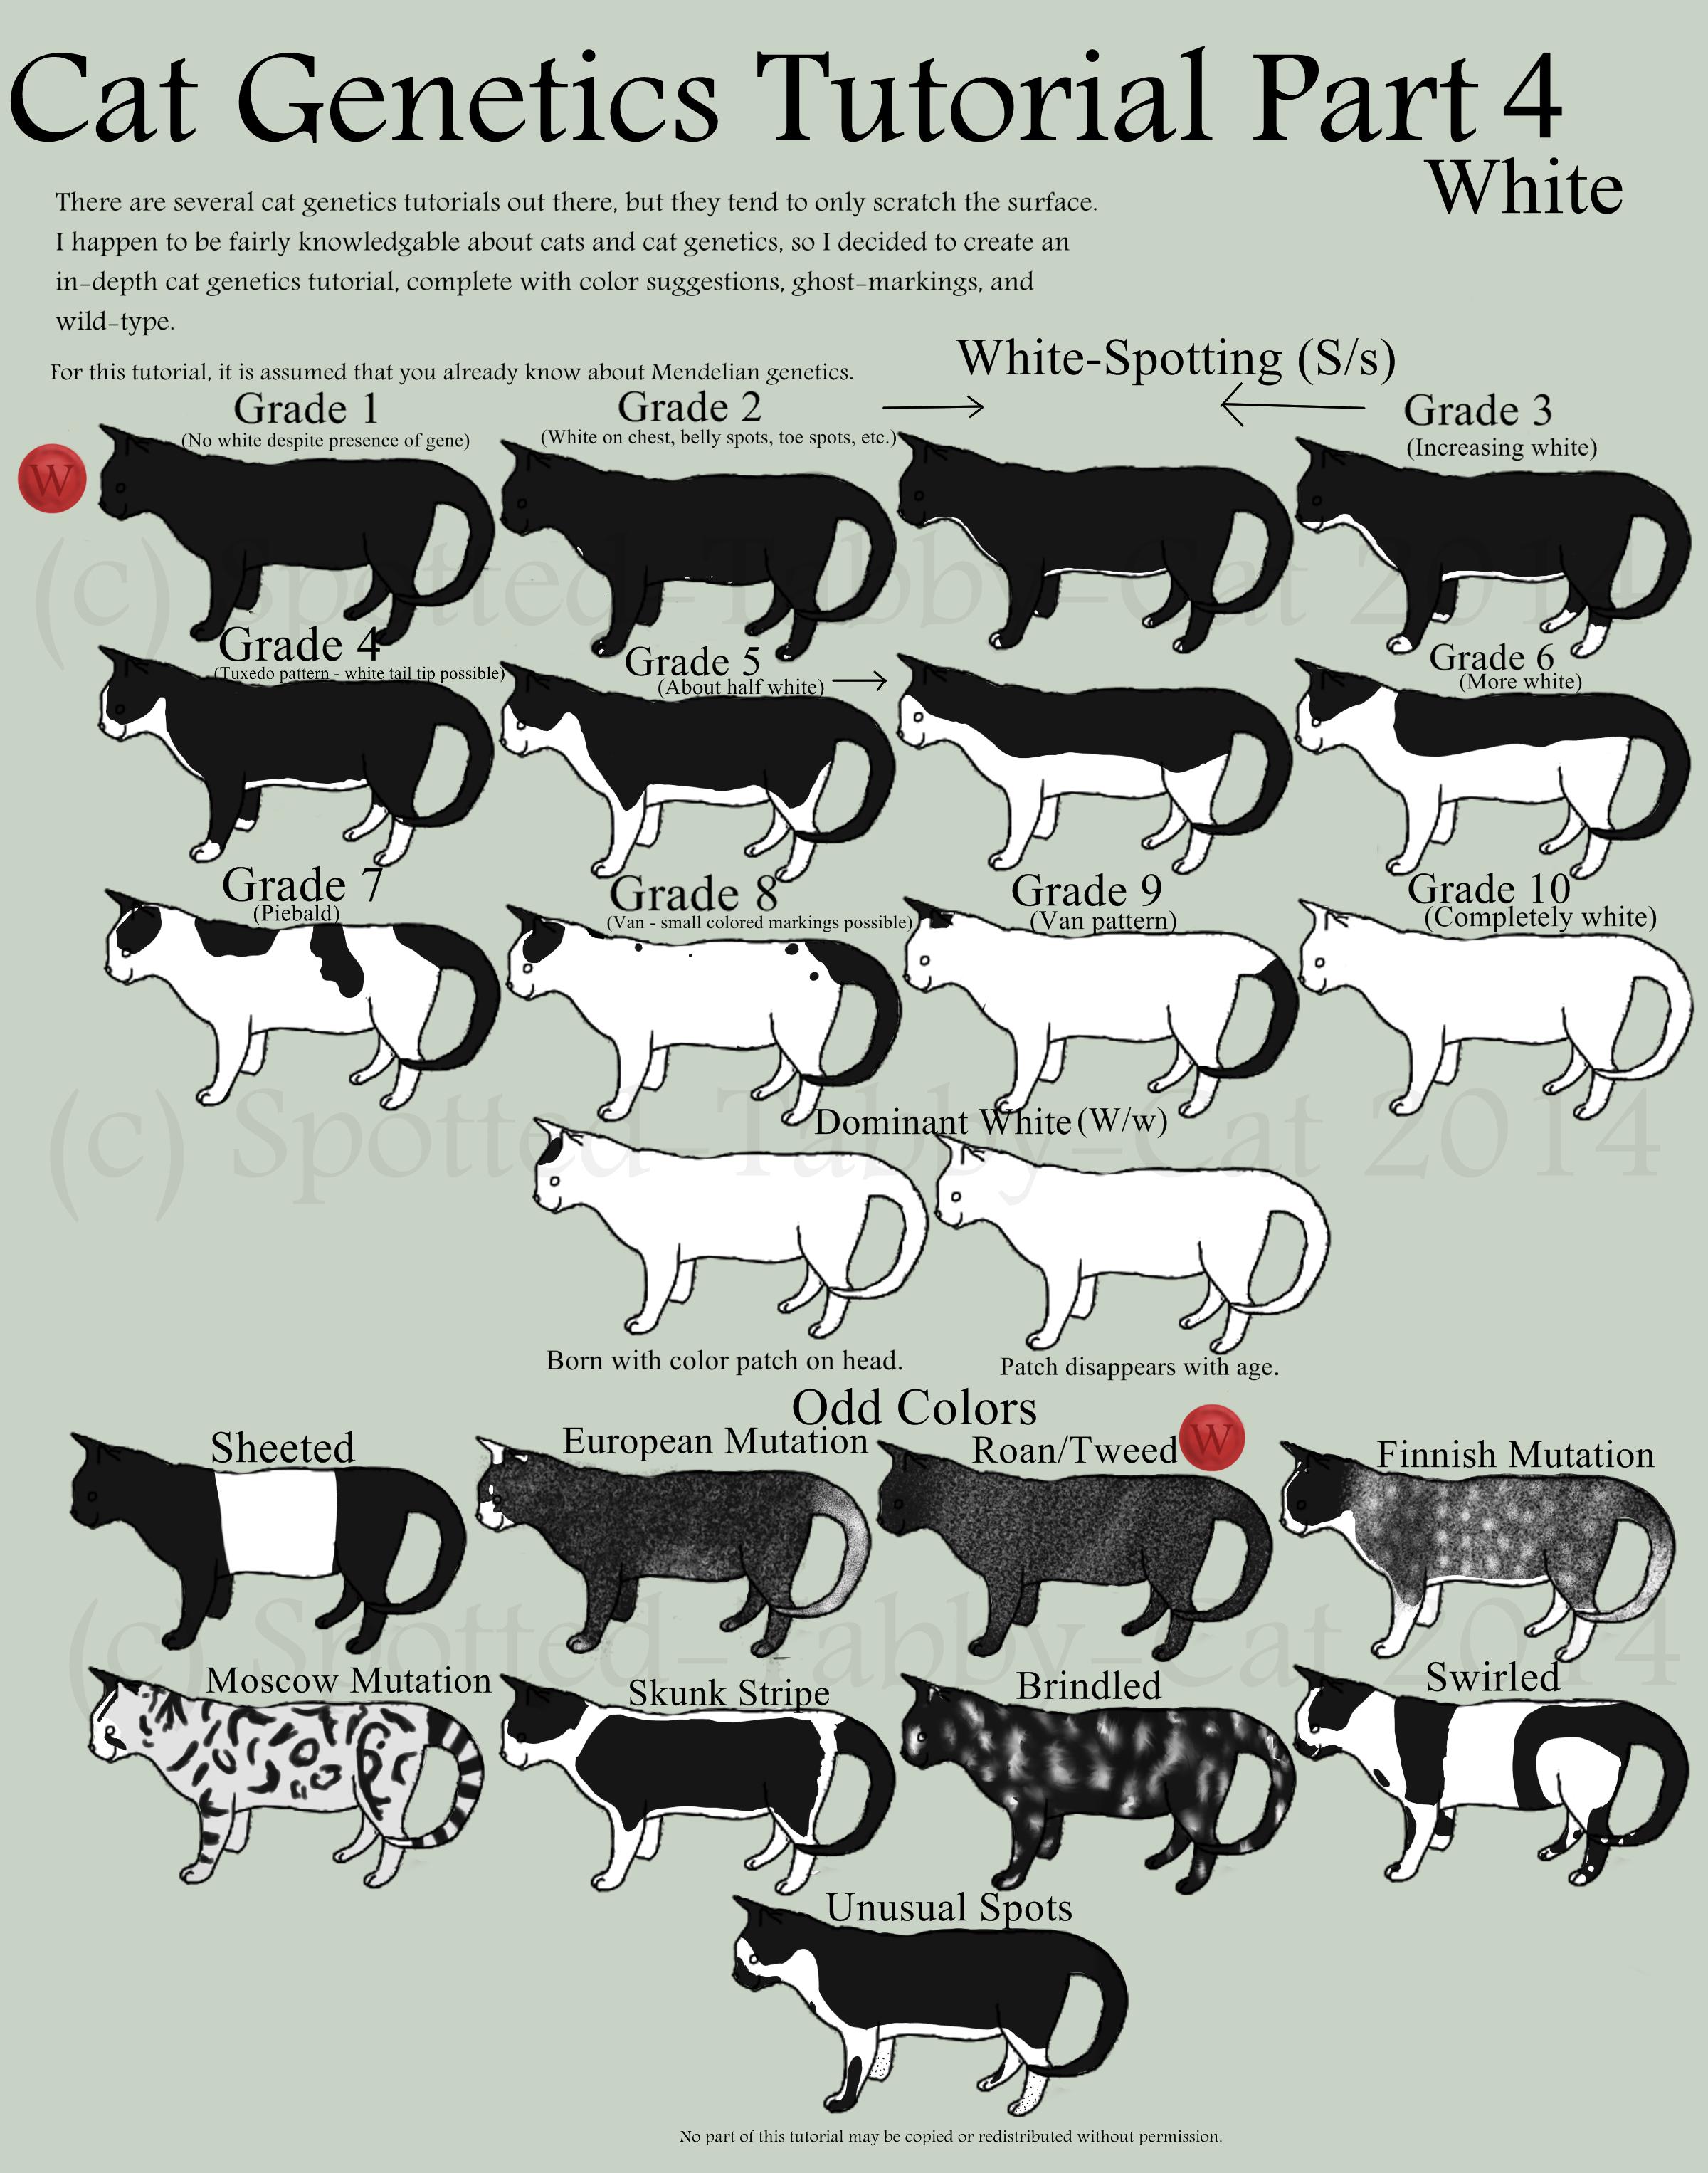 cat genetics tutorial part 4 white by spotted tabby cat deviantart com on deviantart [ 2400 x 3053 Pixel ]